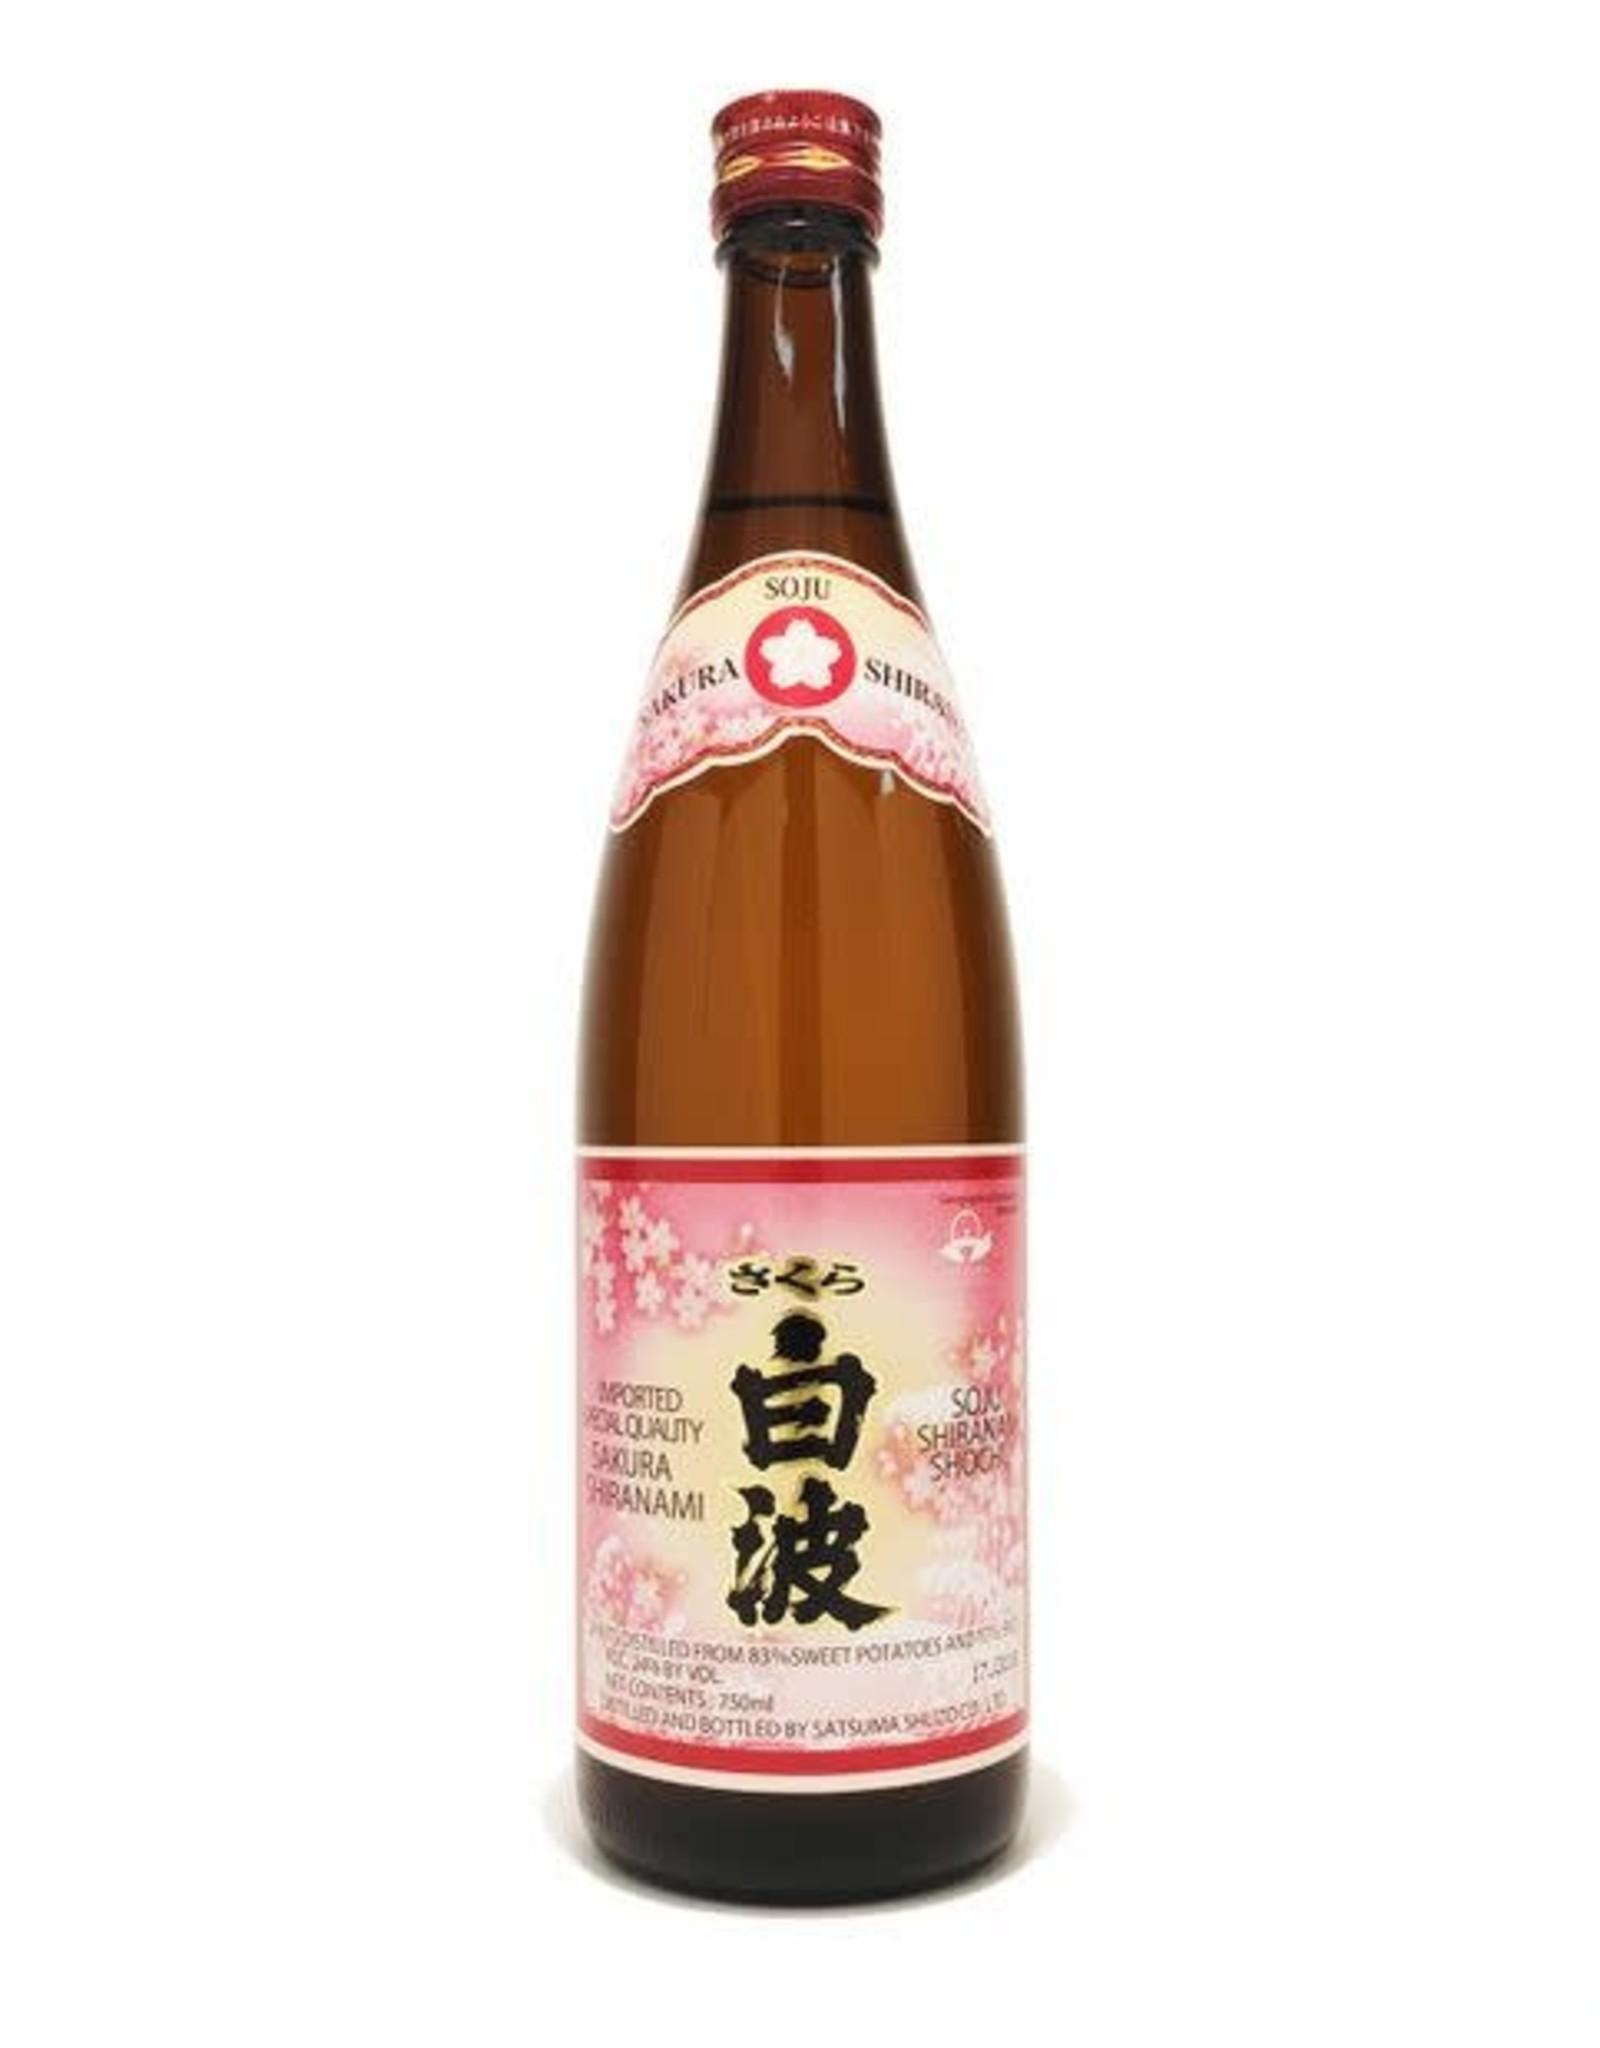 Japan Sakura Shiranami Shochu